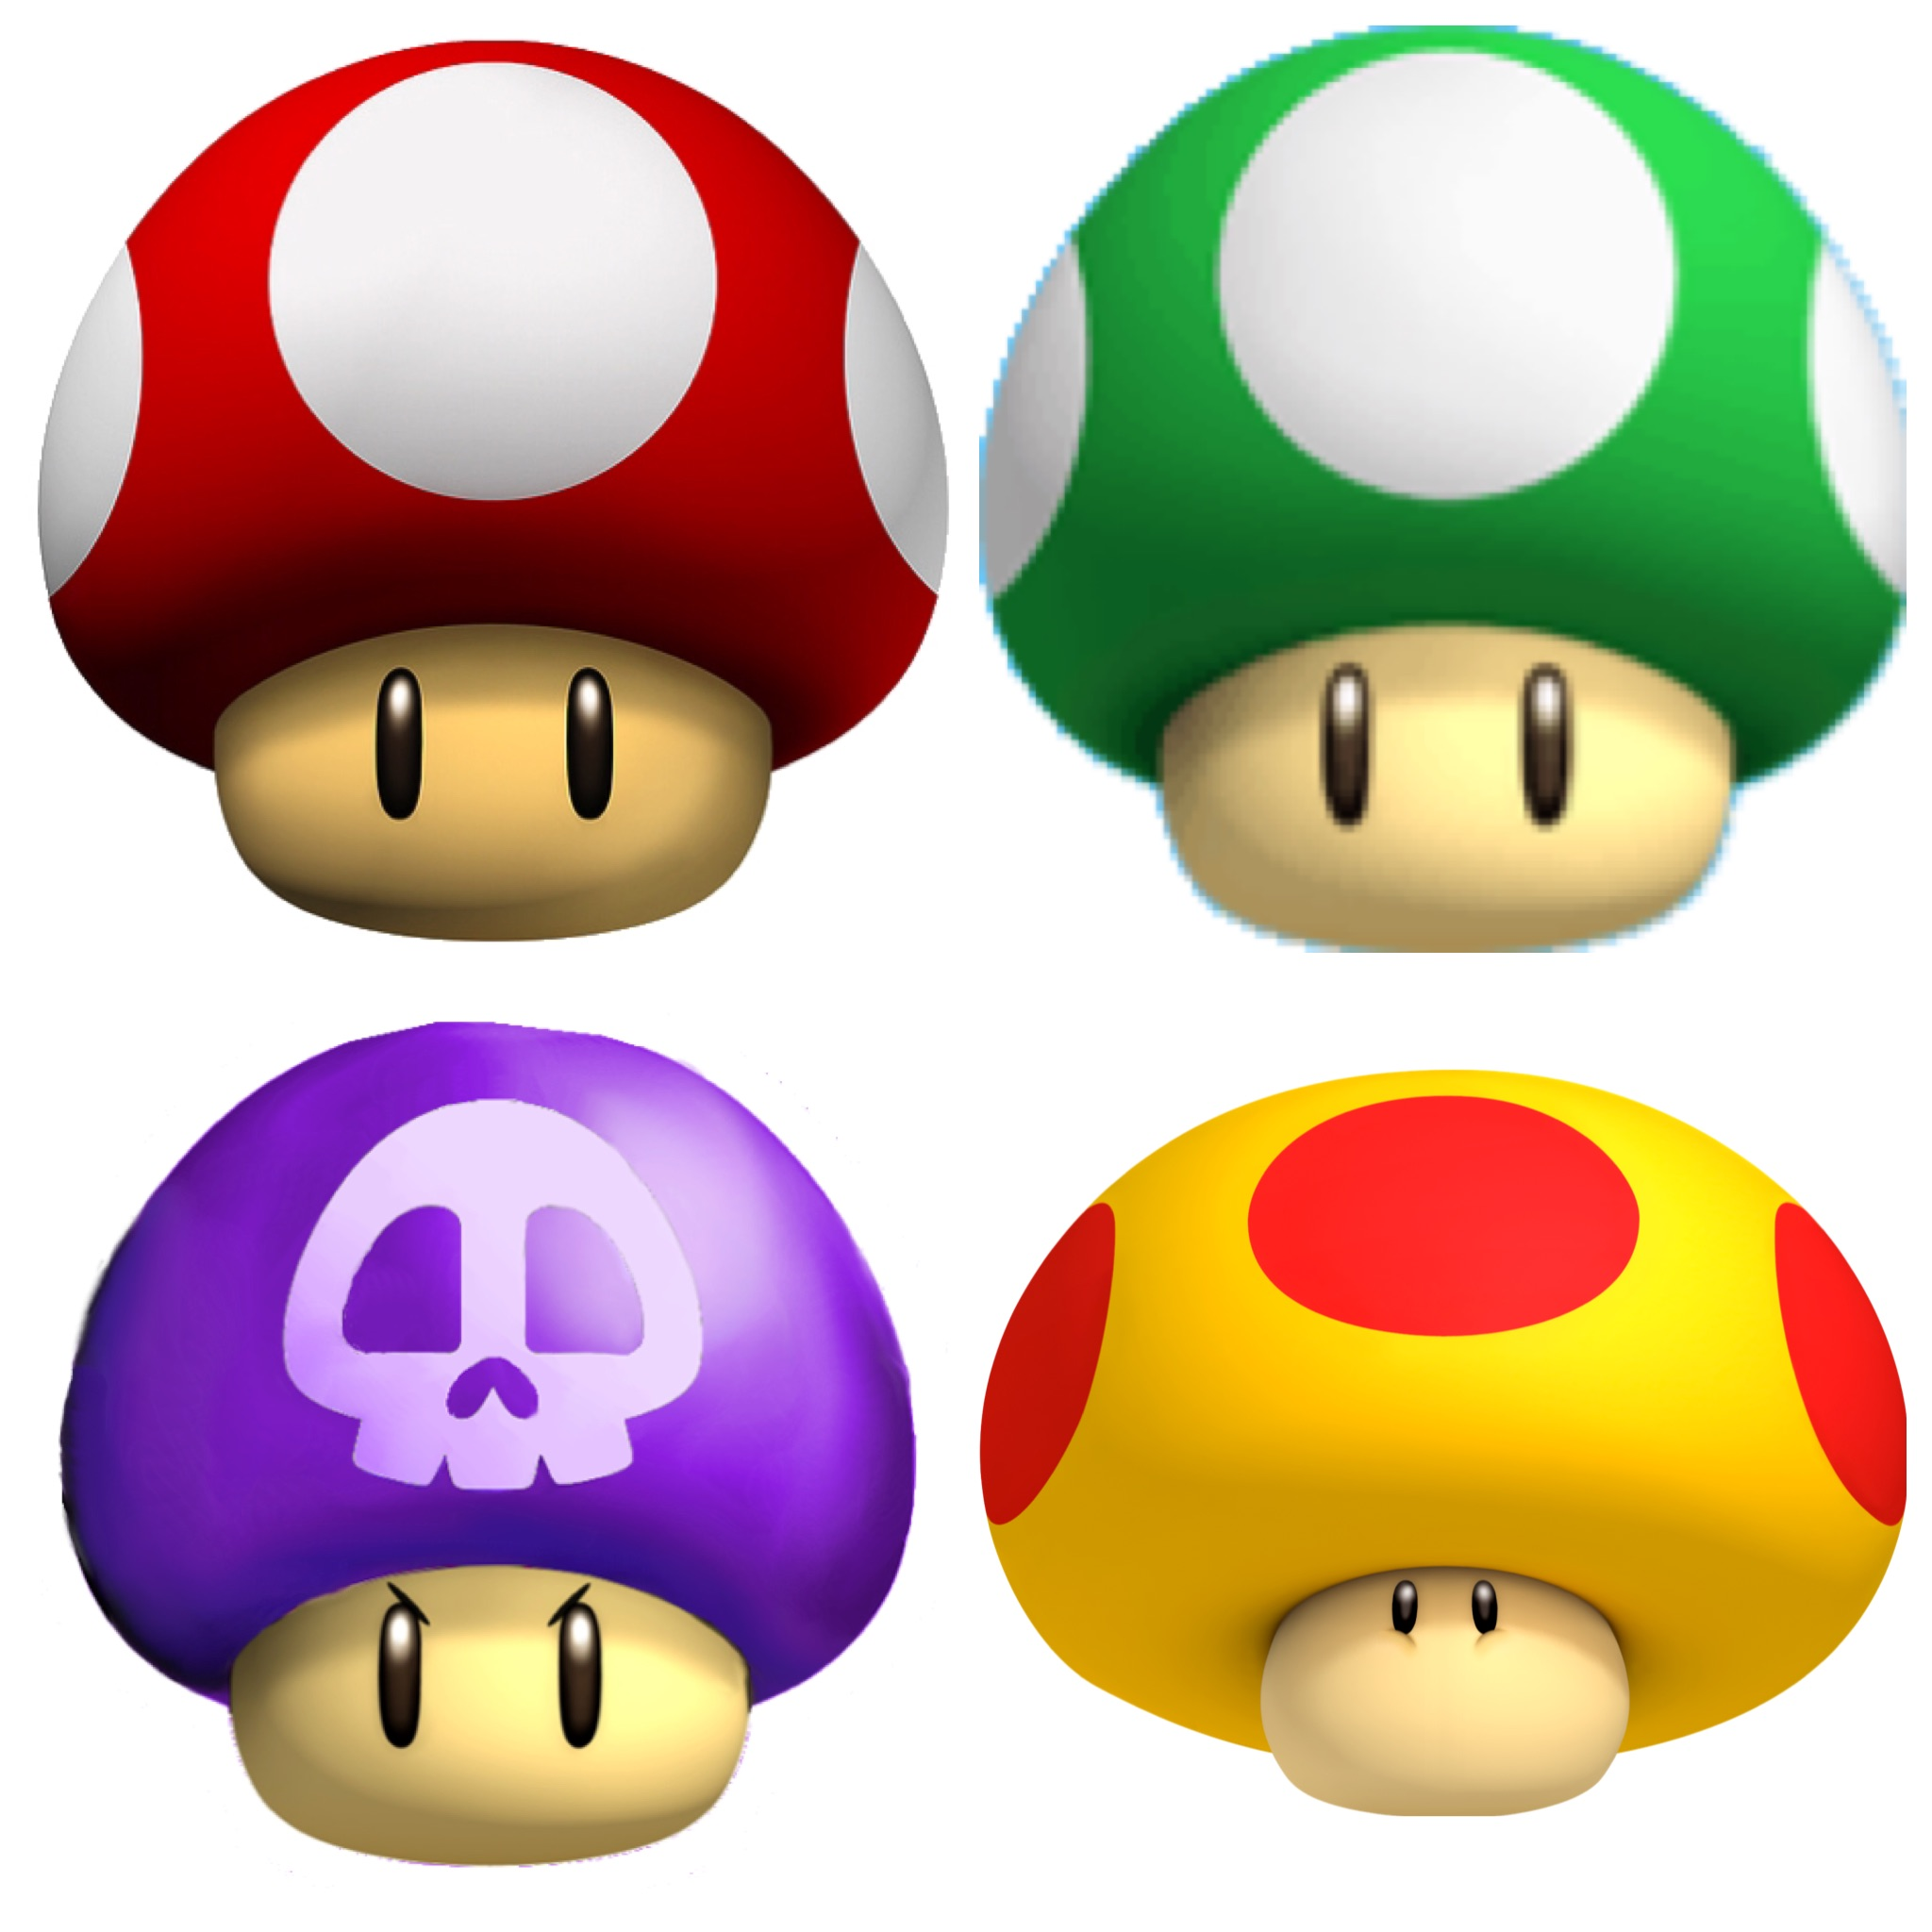 Mega Mushroom - Super Mario Wiki, the Mario encyclopedia